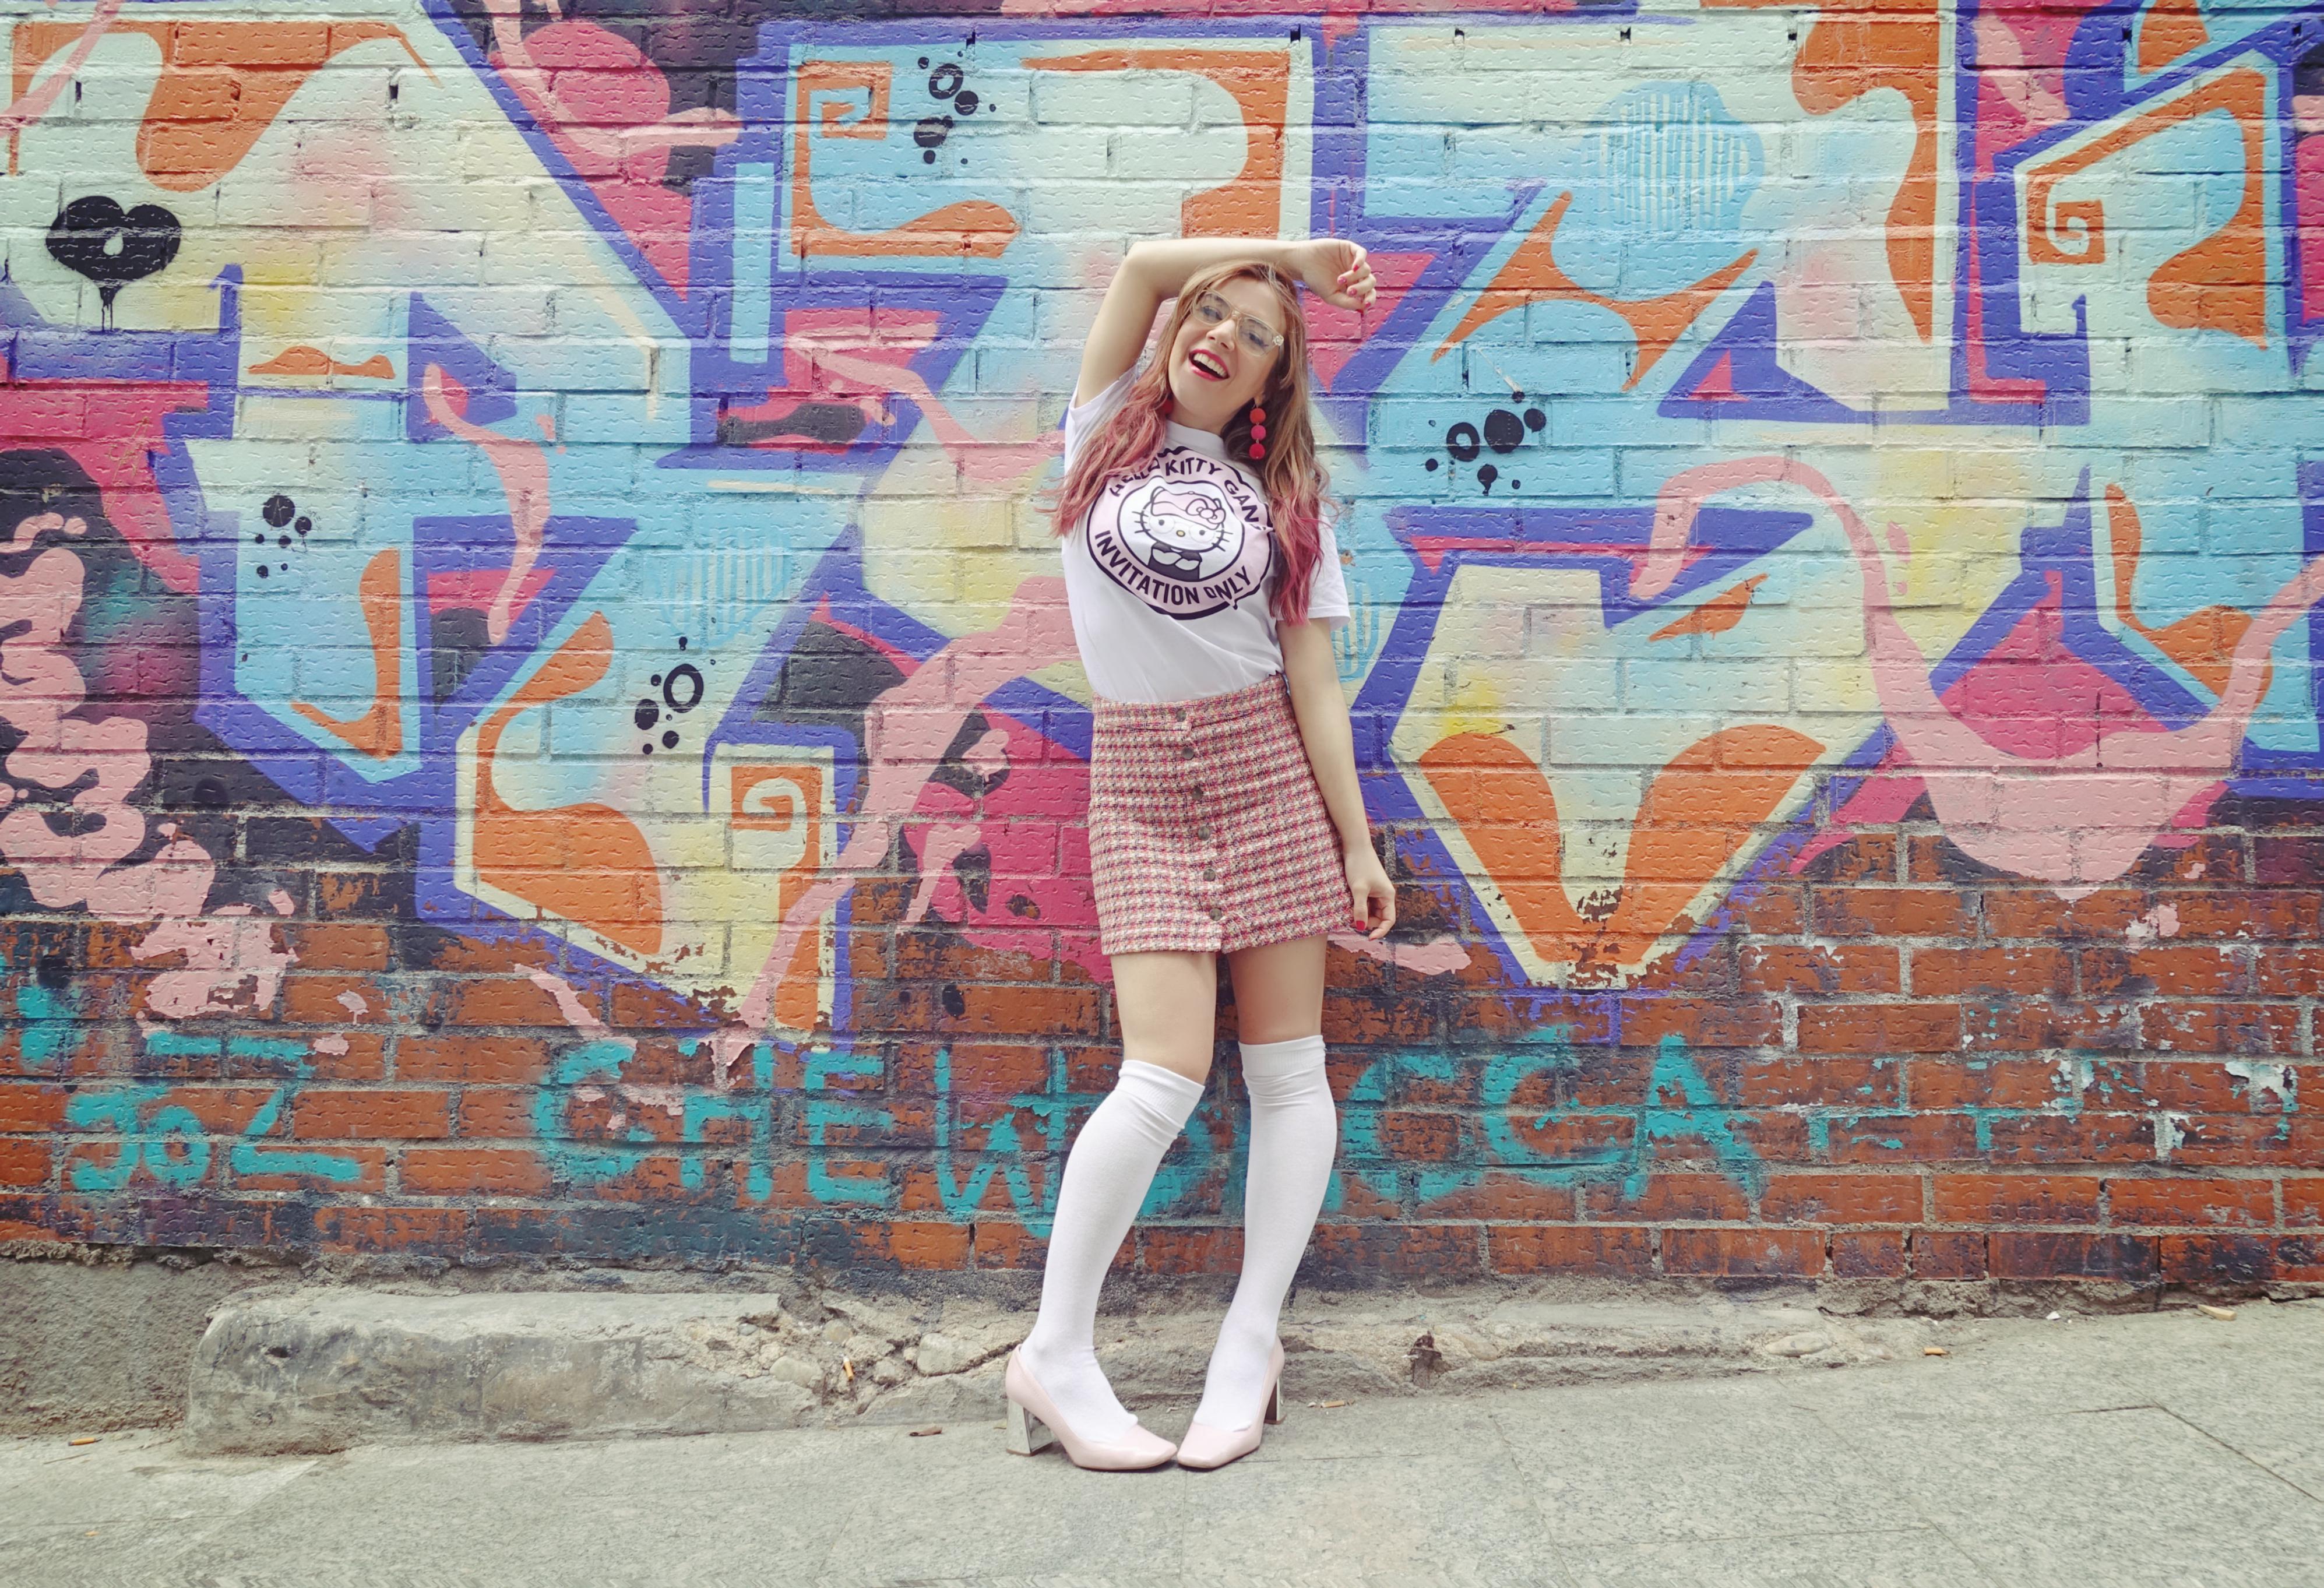 Fashionista-ChicAdicta-blog-de-moda-Chic-Adicta-influencer-look-hello-kitty-falda-pata-de-gallo-PiensaenChic-Piensa-en-Chic